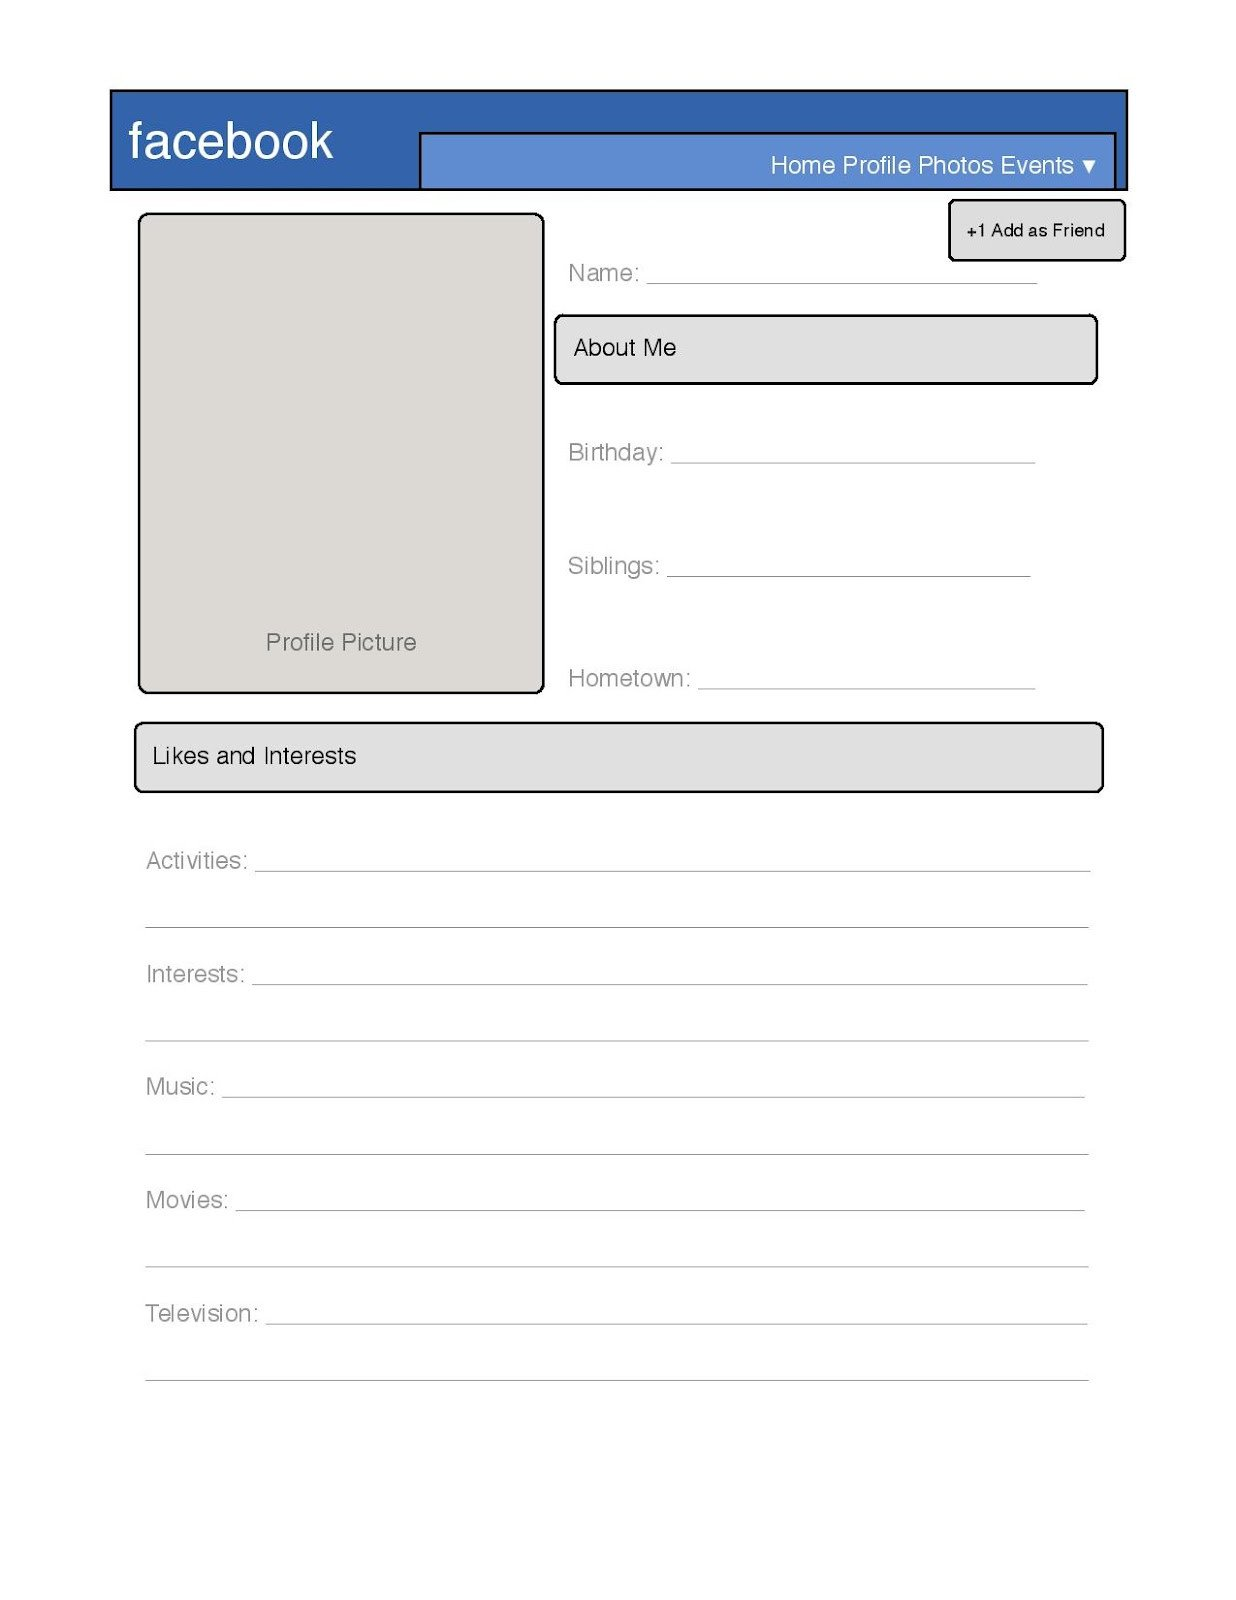 Facebook Profile Page Template Esl Candy June 2012